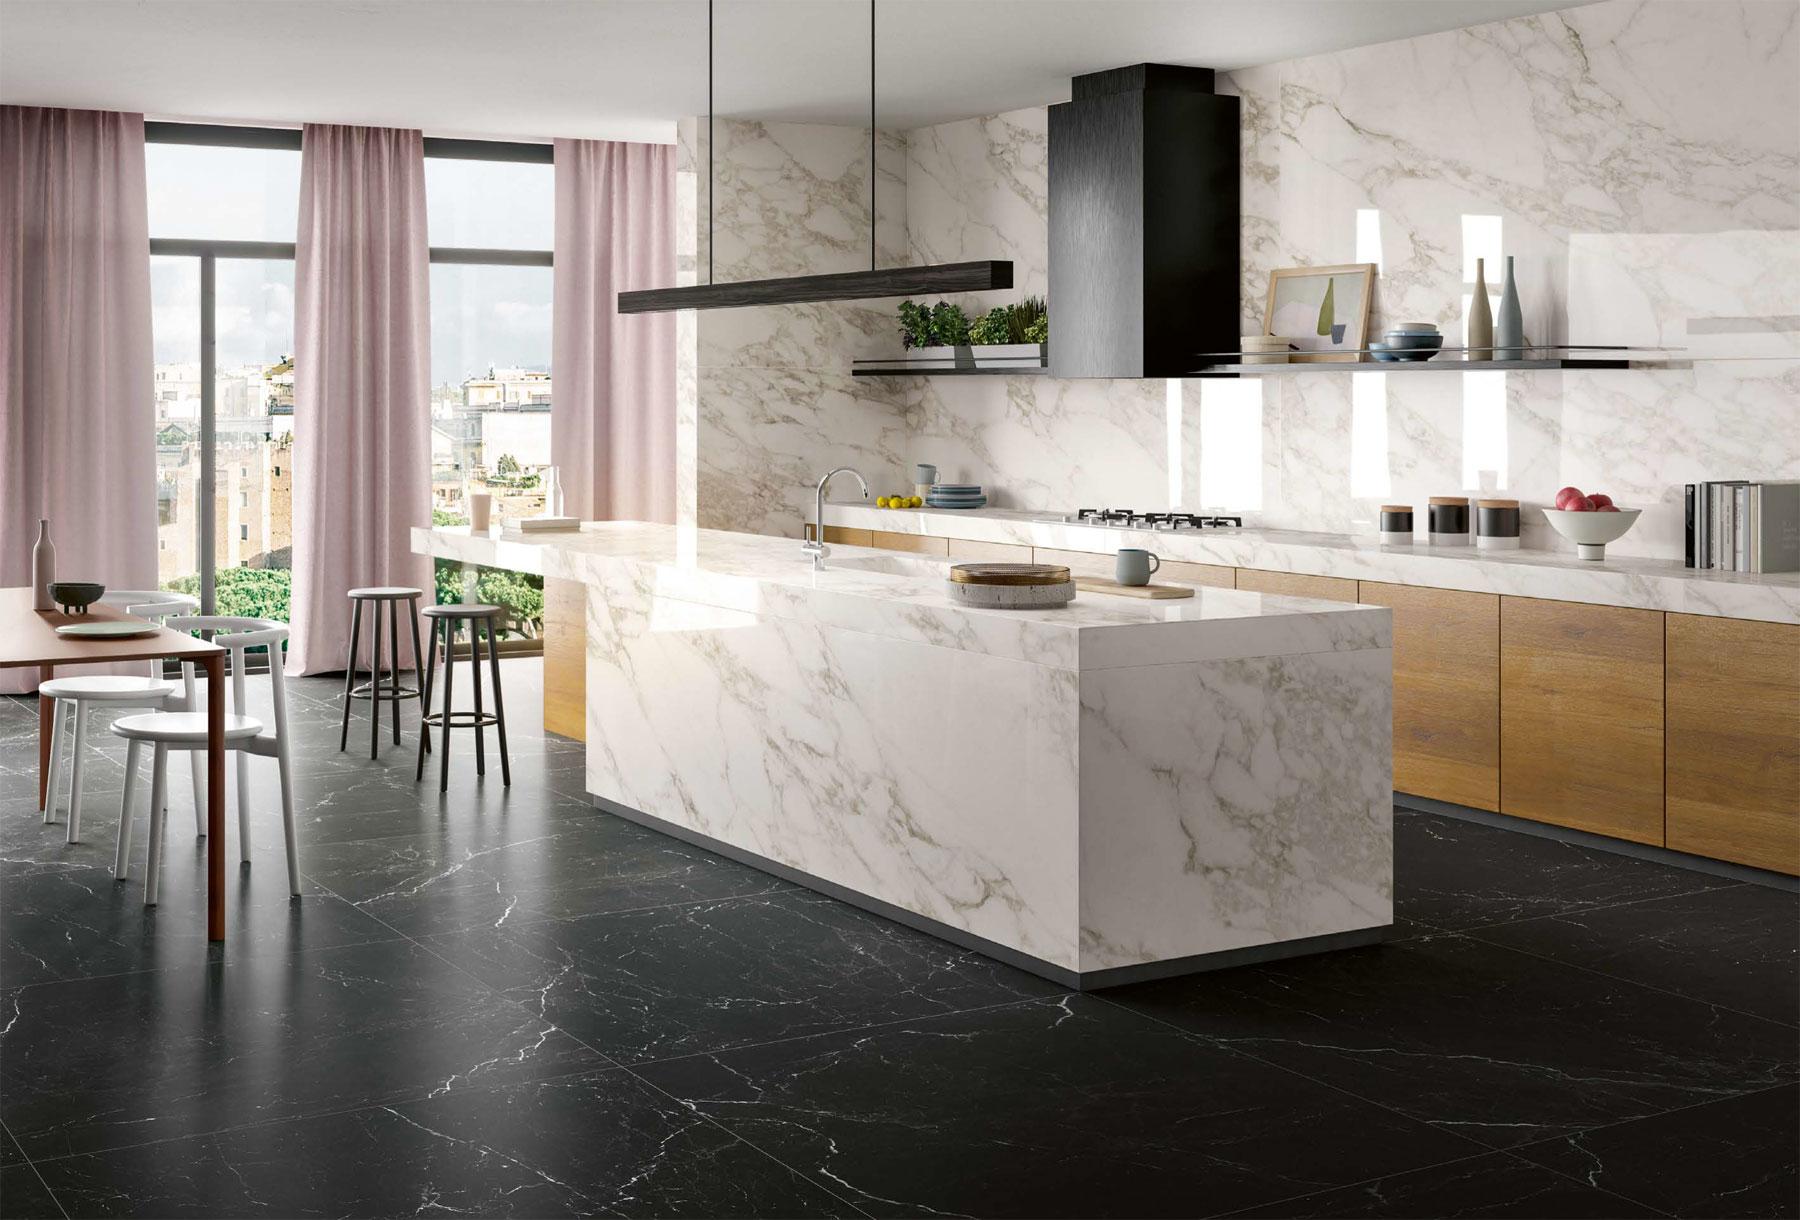 Marche Di Arredo Bagno.Carry Shop Enjoy Your Home